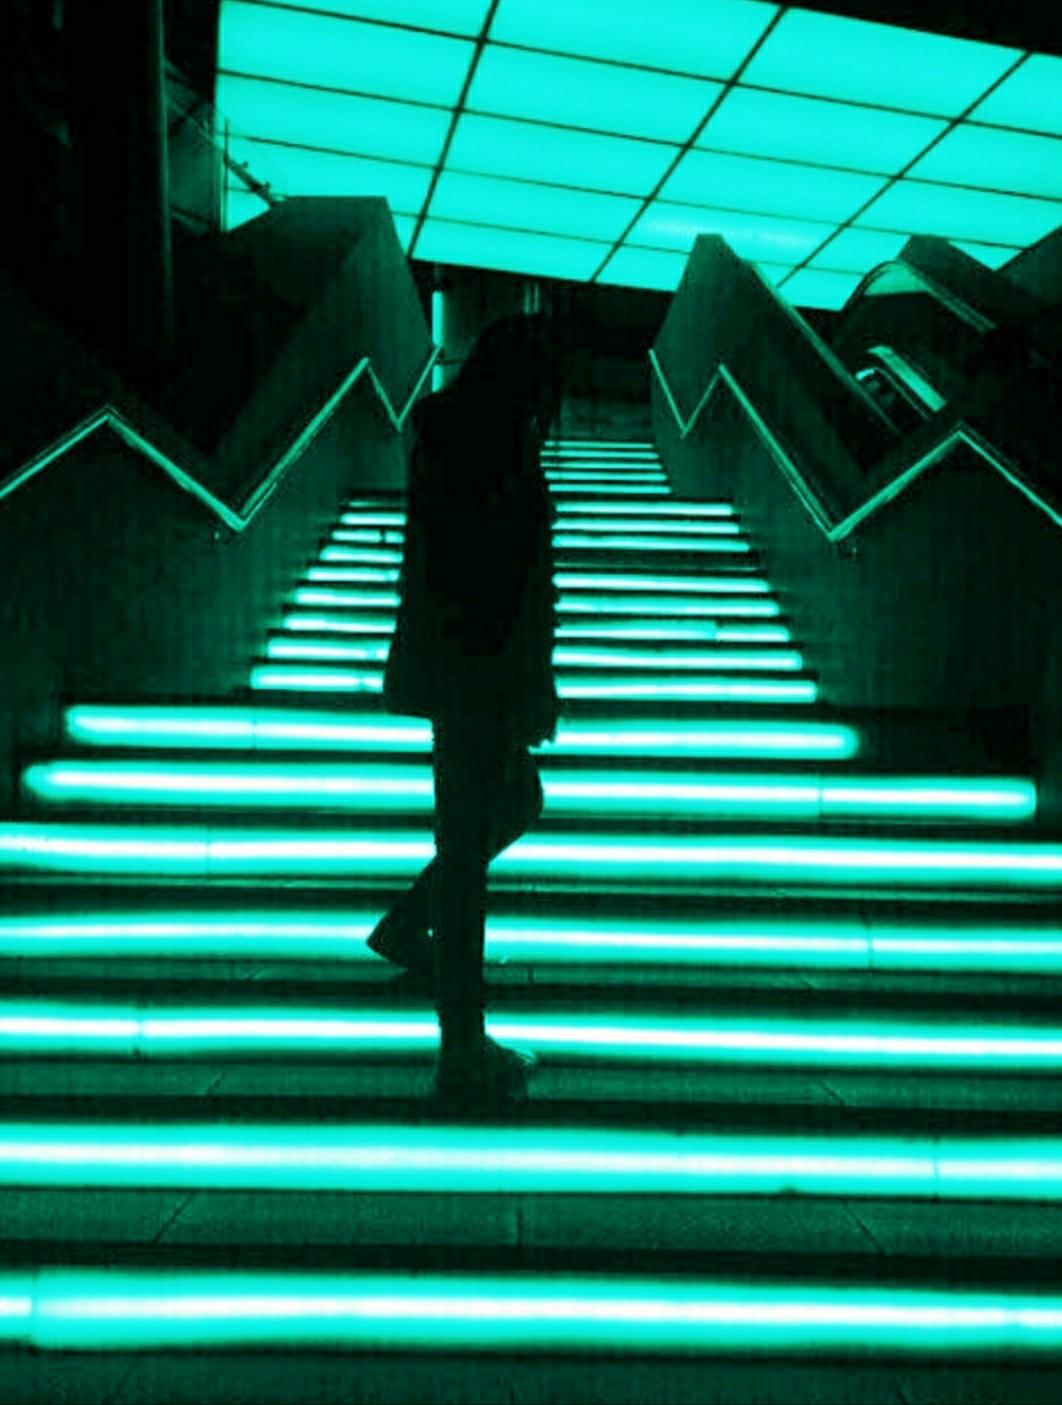 #freetoedit #aesthetic #cyan #photography #mood #aesthetictumblr #photo #followme #cyanaesthetic #tumblr #girl #shadow #lights #neon #tumblrgirl #beautifu